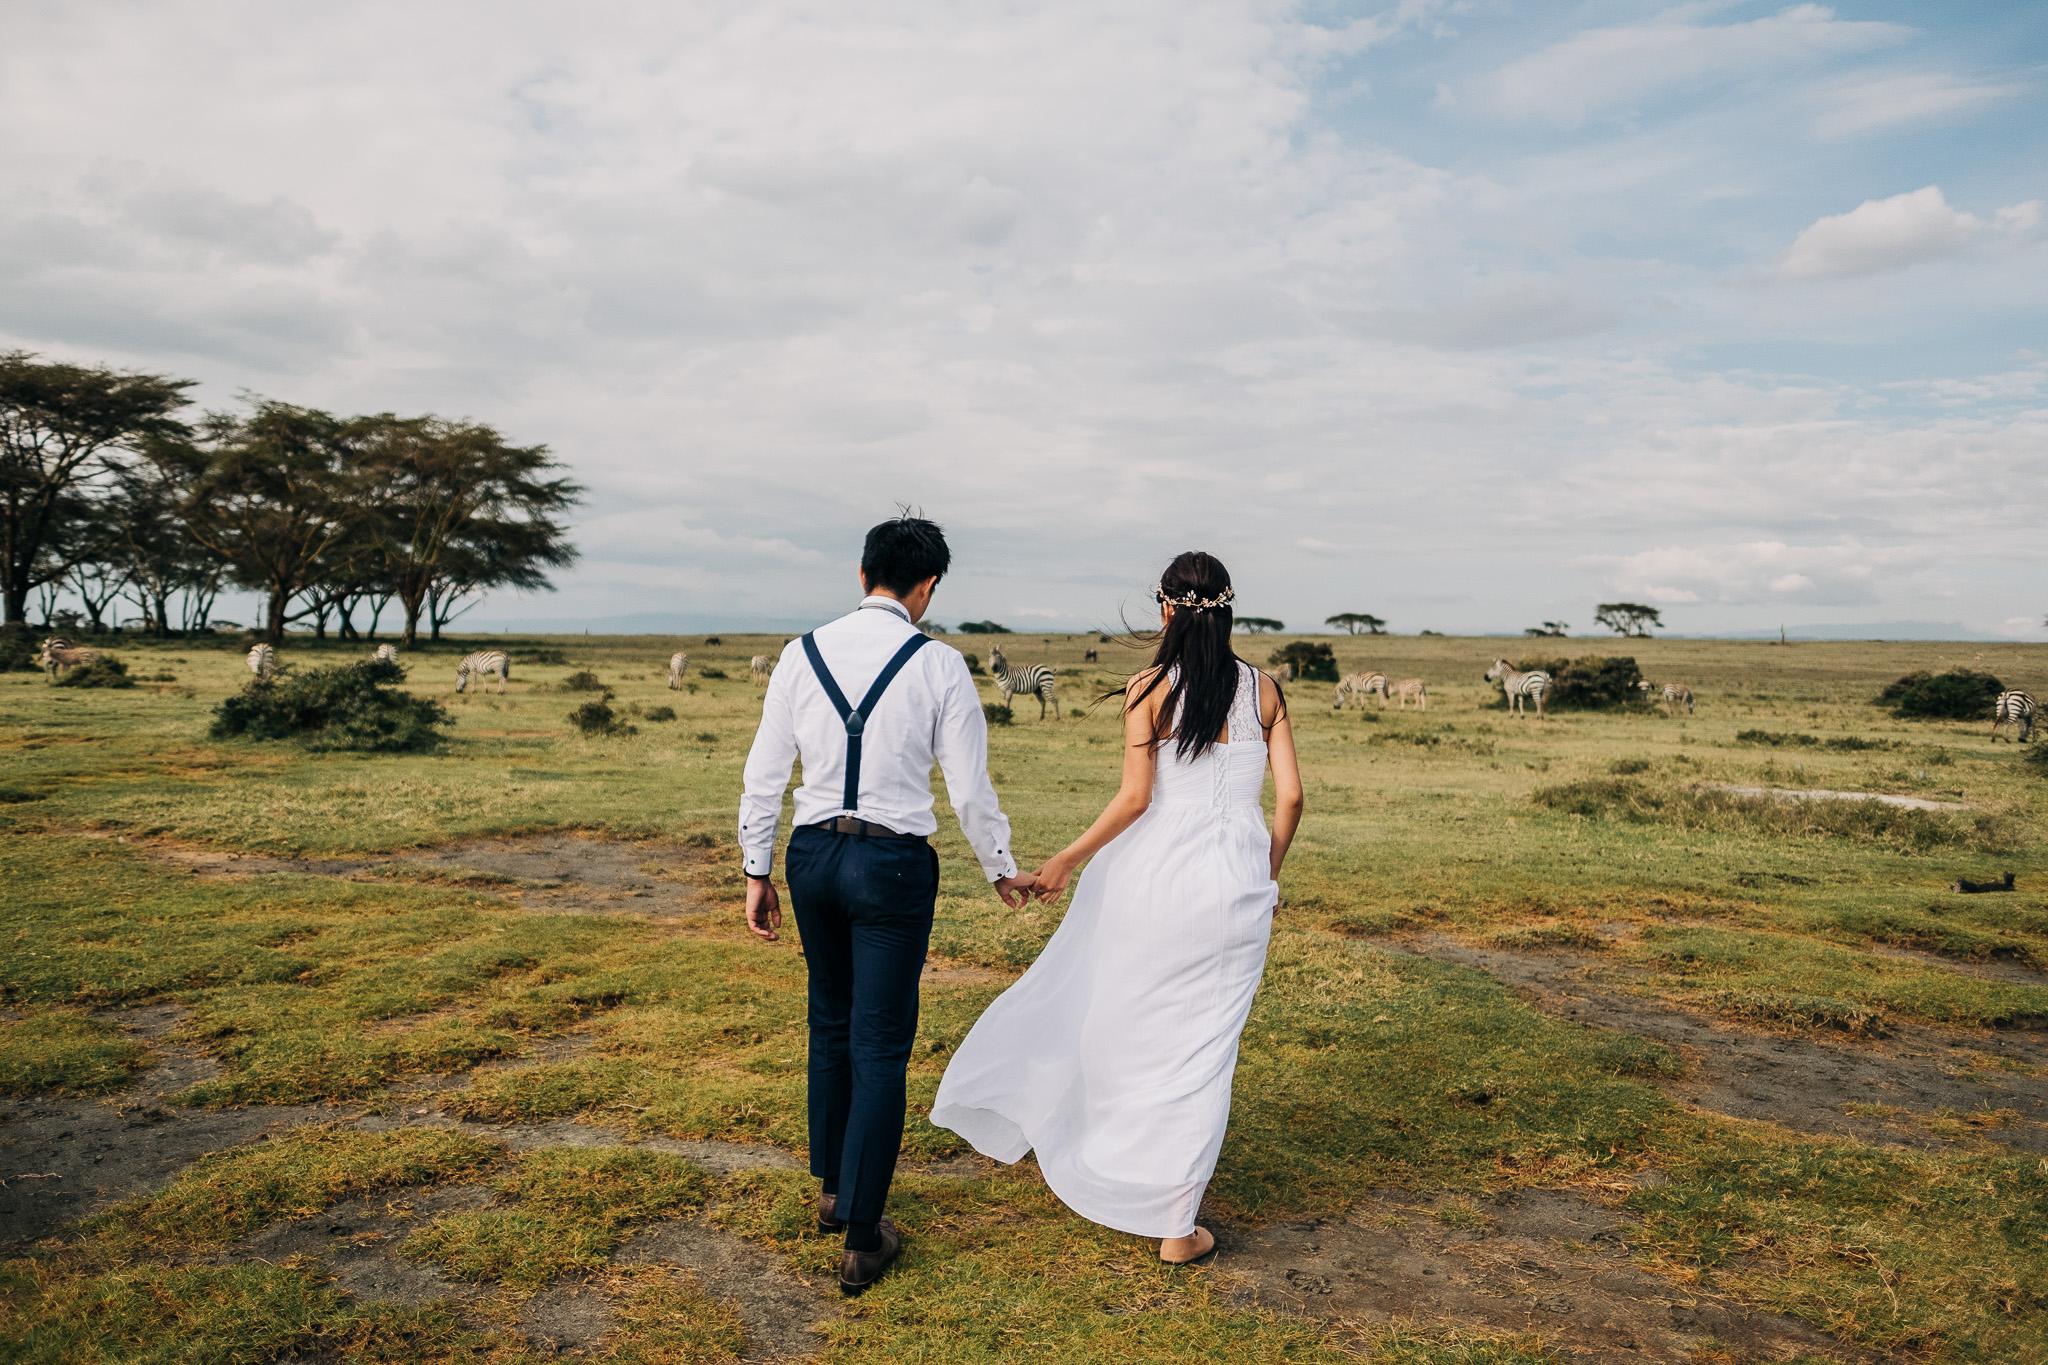 Anna-Hari-Photography-Safari-Elopement-Kenya-Wedding-Photographer-Kenya-18.jpg